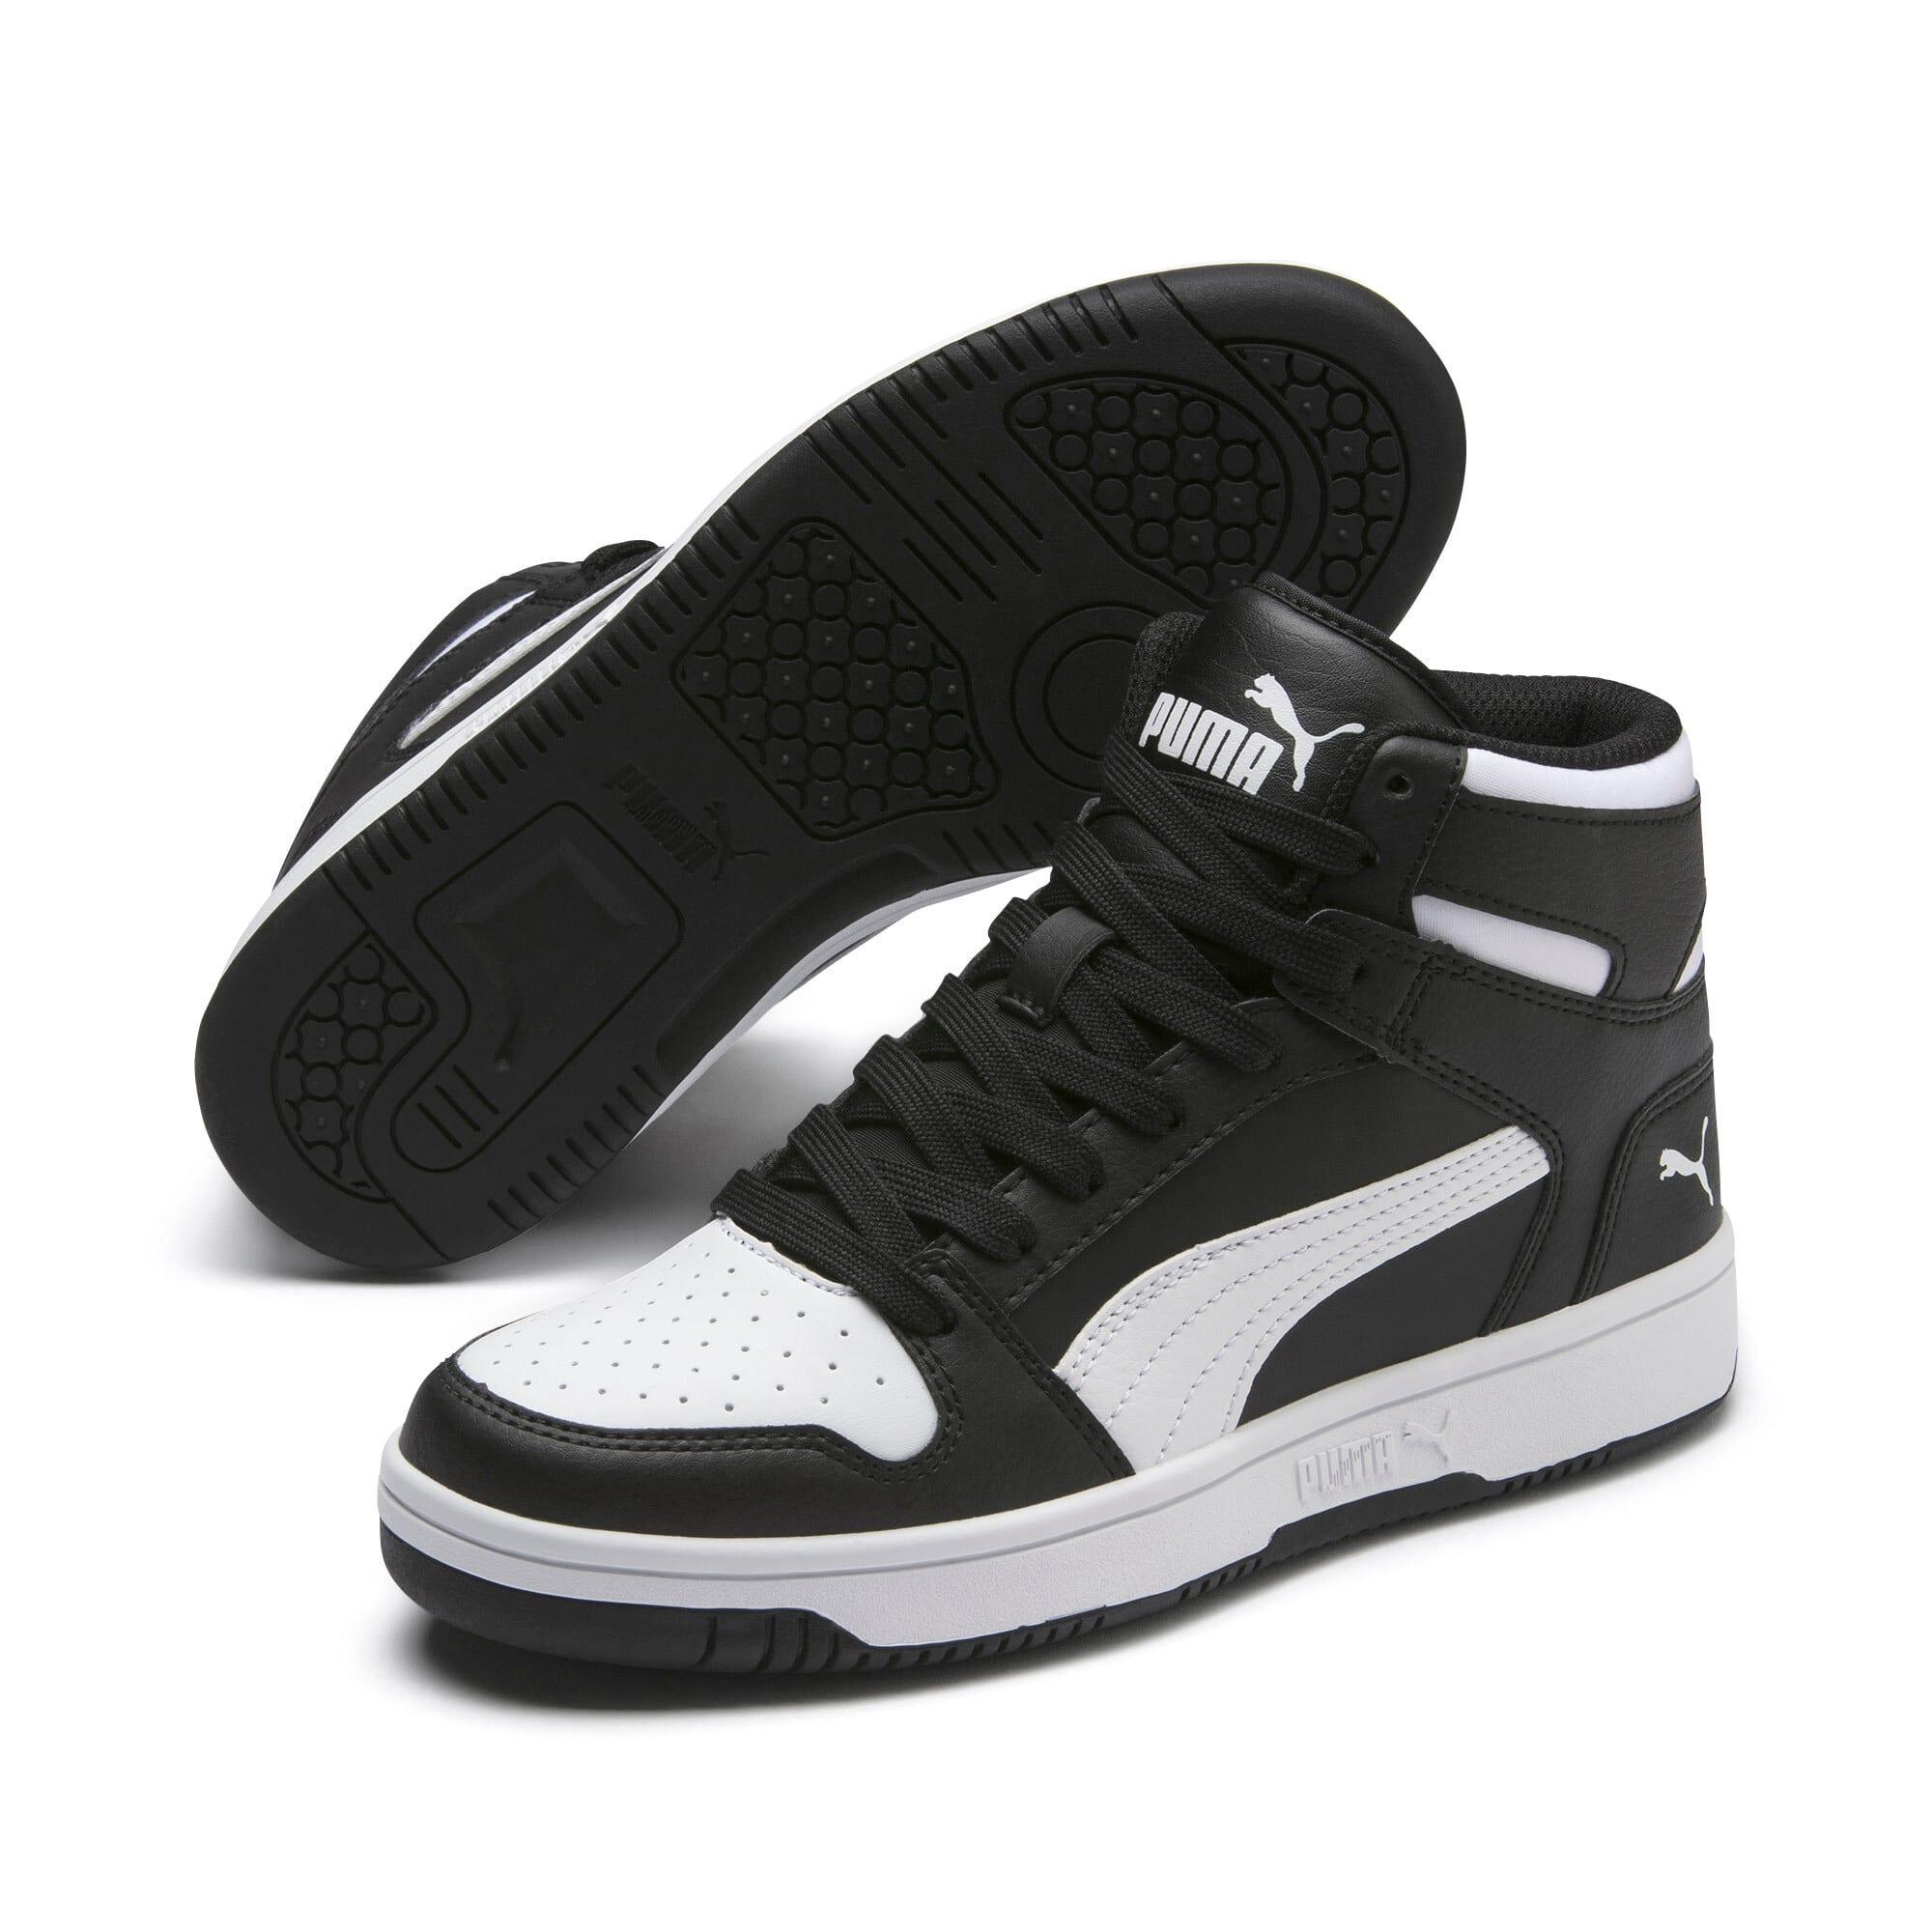 Thumbnail 2 of PUMA Rebound LayUp Mid Sneakers JR, Puma Black-Puma White, medium